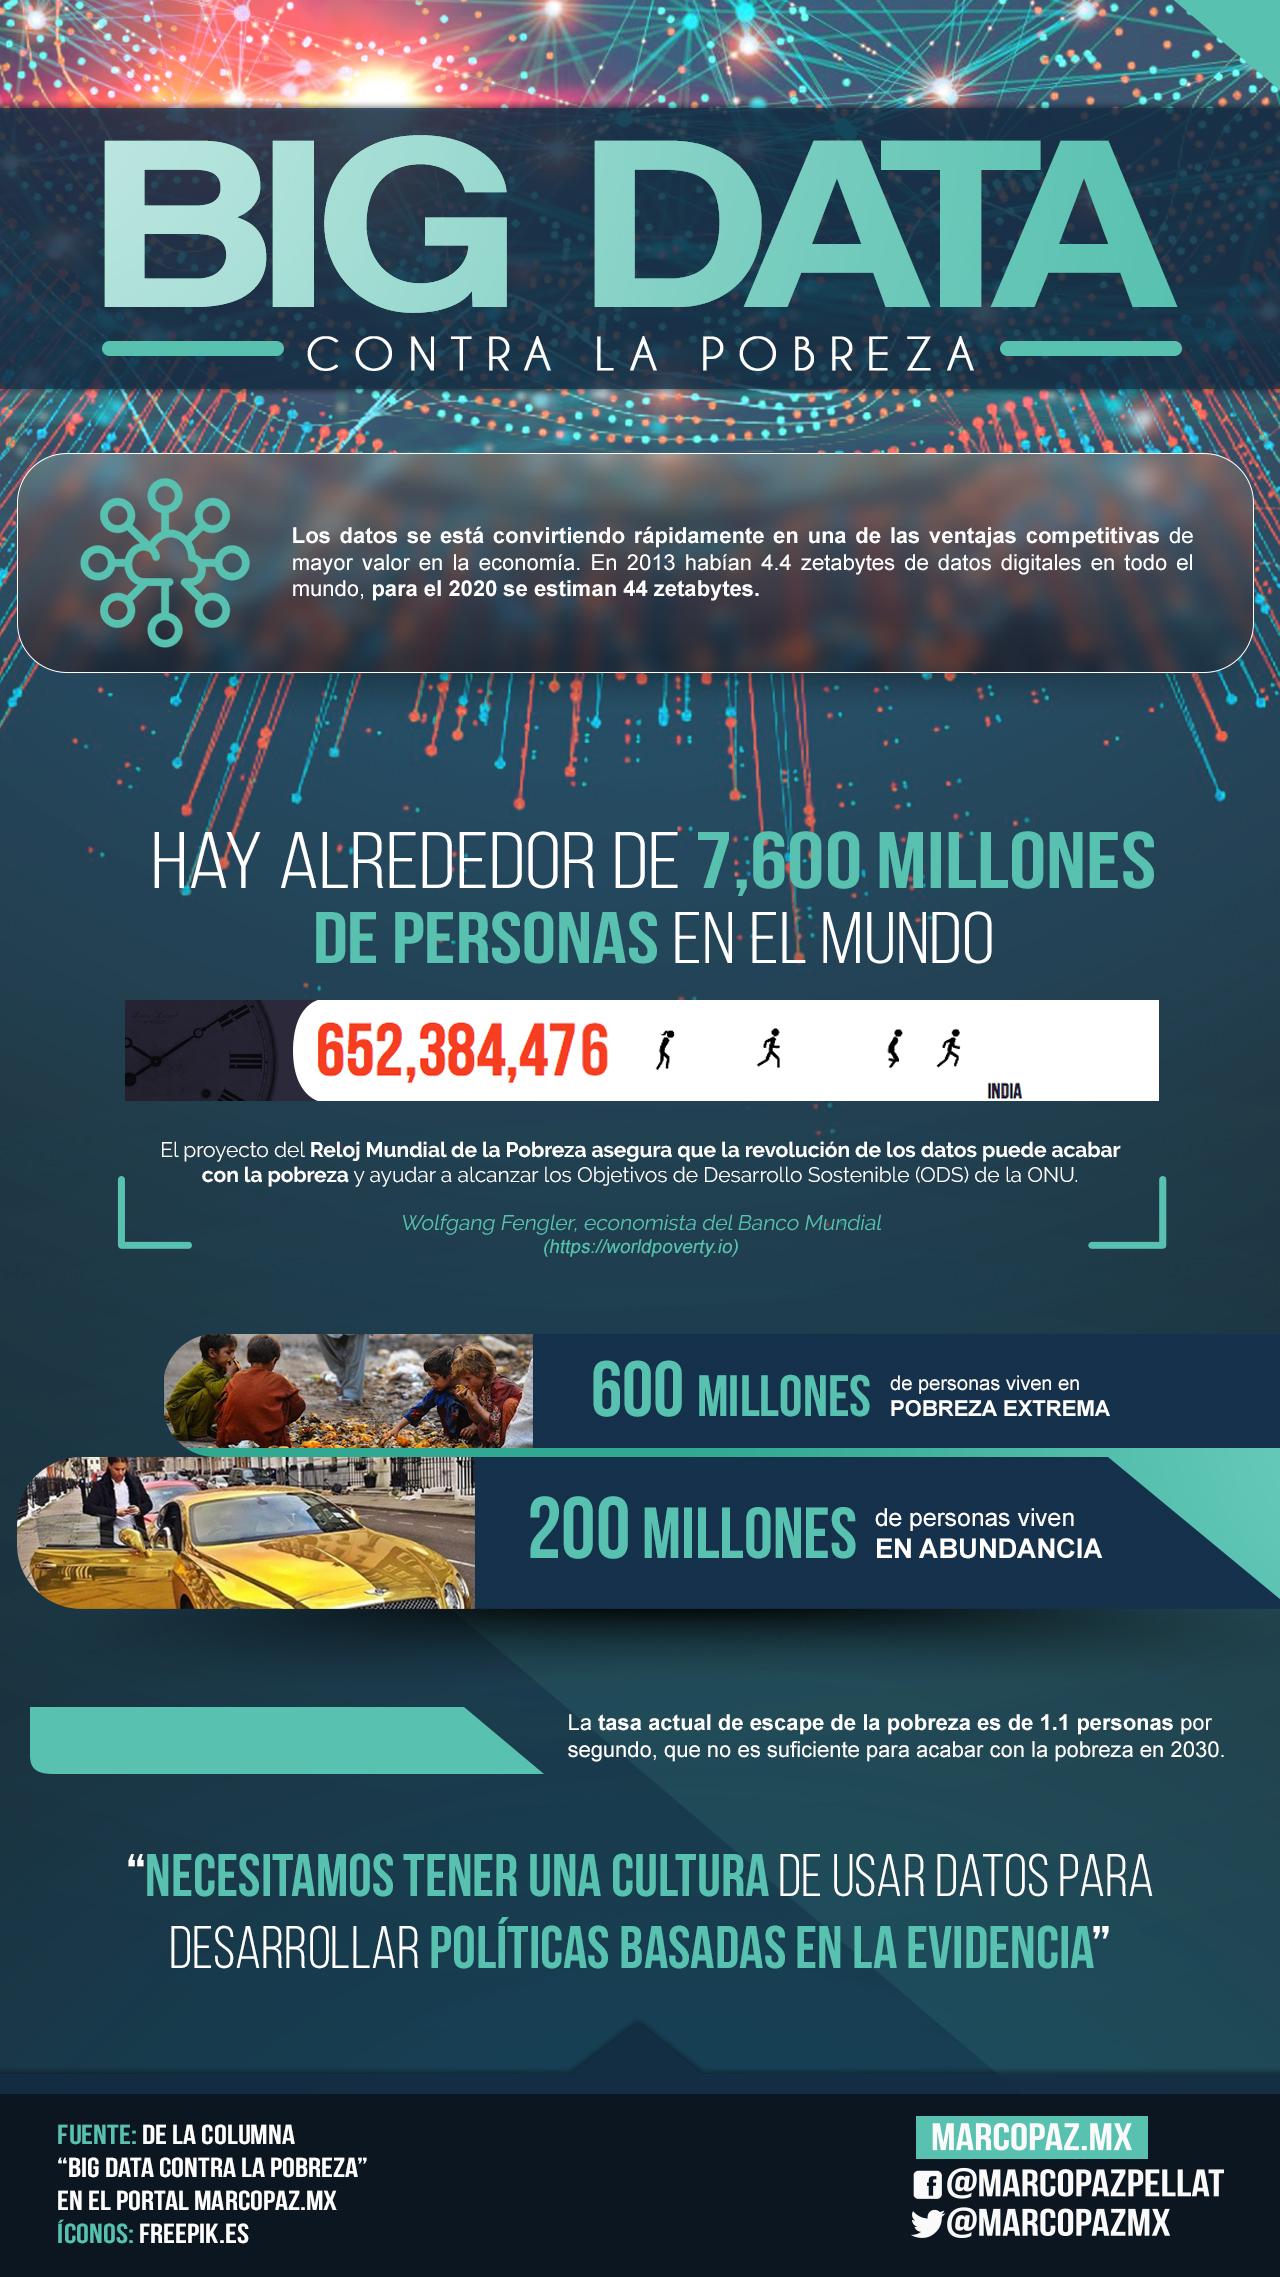 66_INFOGRAFIA_Big data contra la pobreza copy